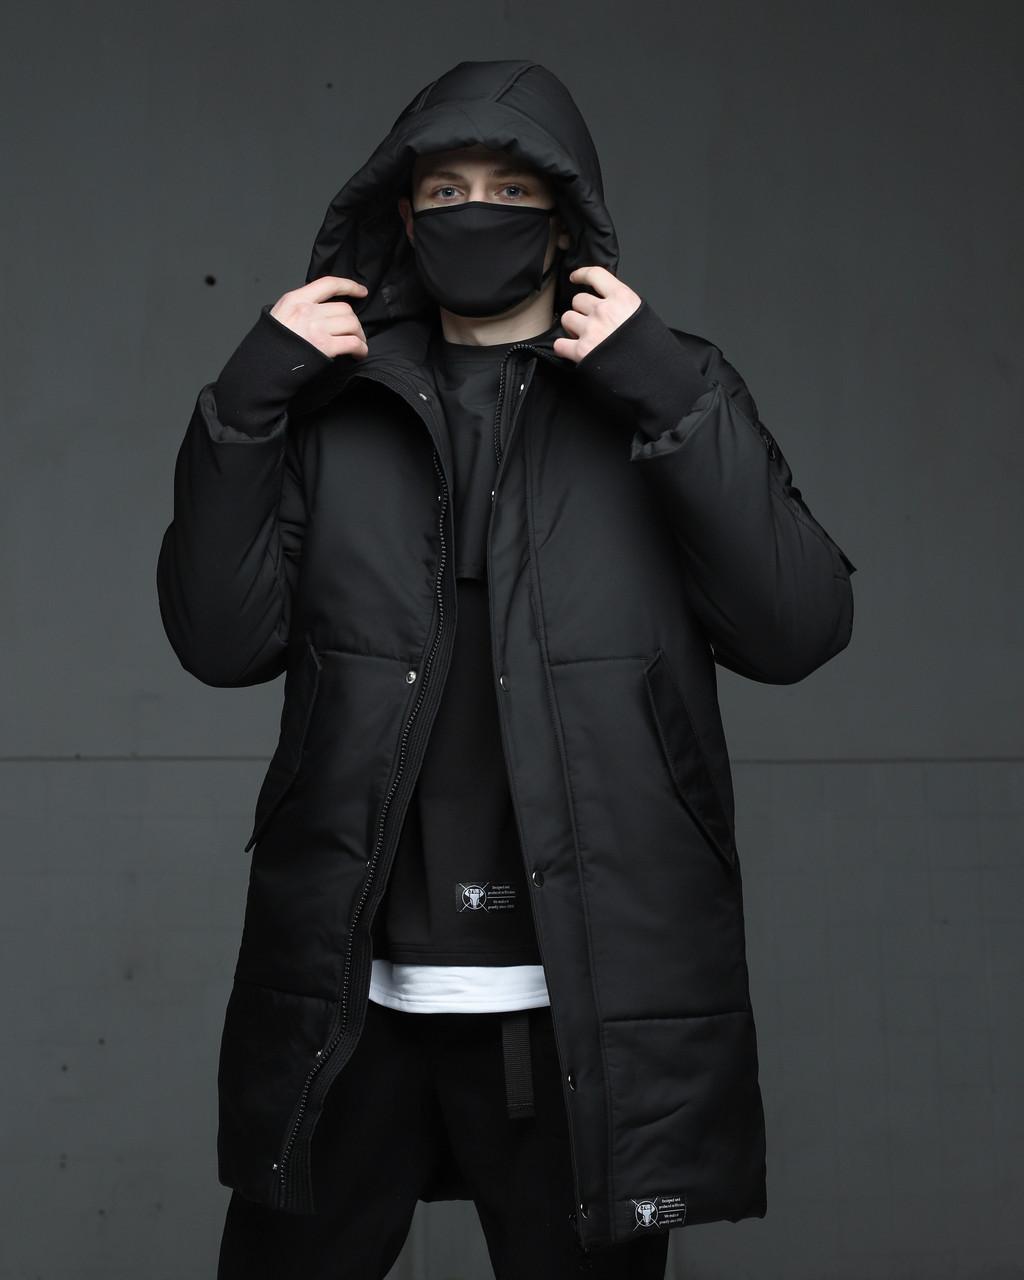 Зимняя мужская парка куртка черная Зорг (Zorg) от бренда ТУР